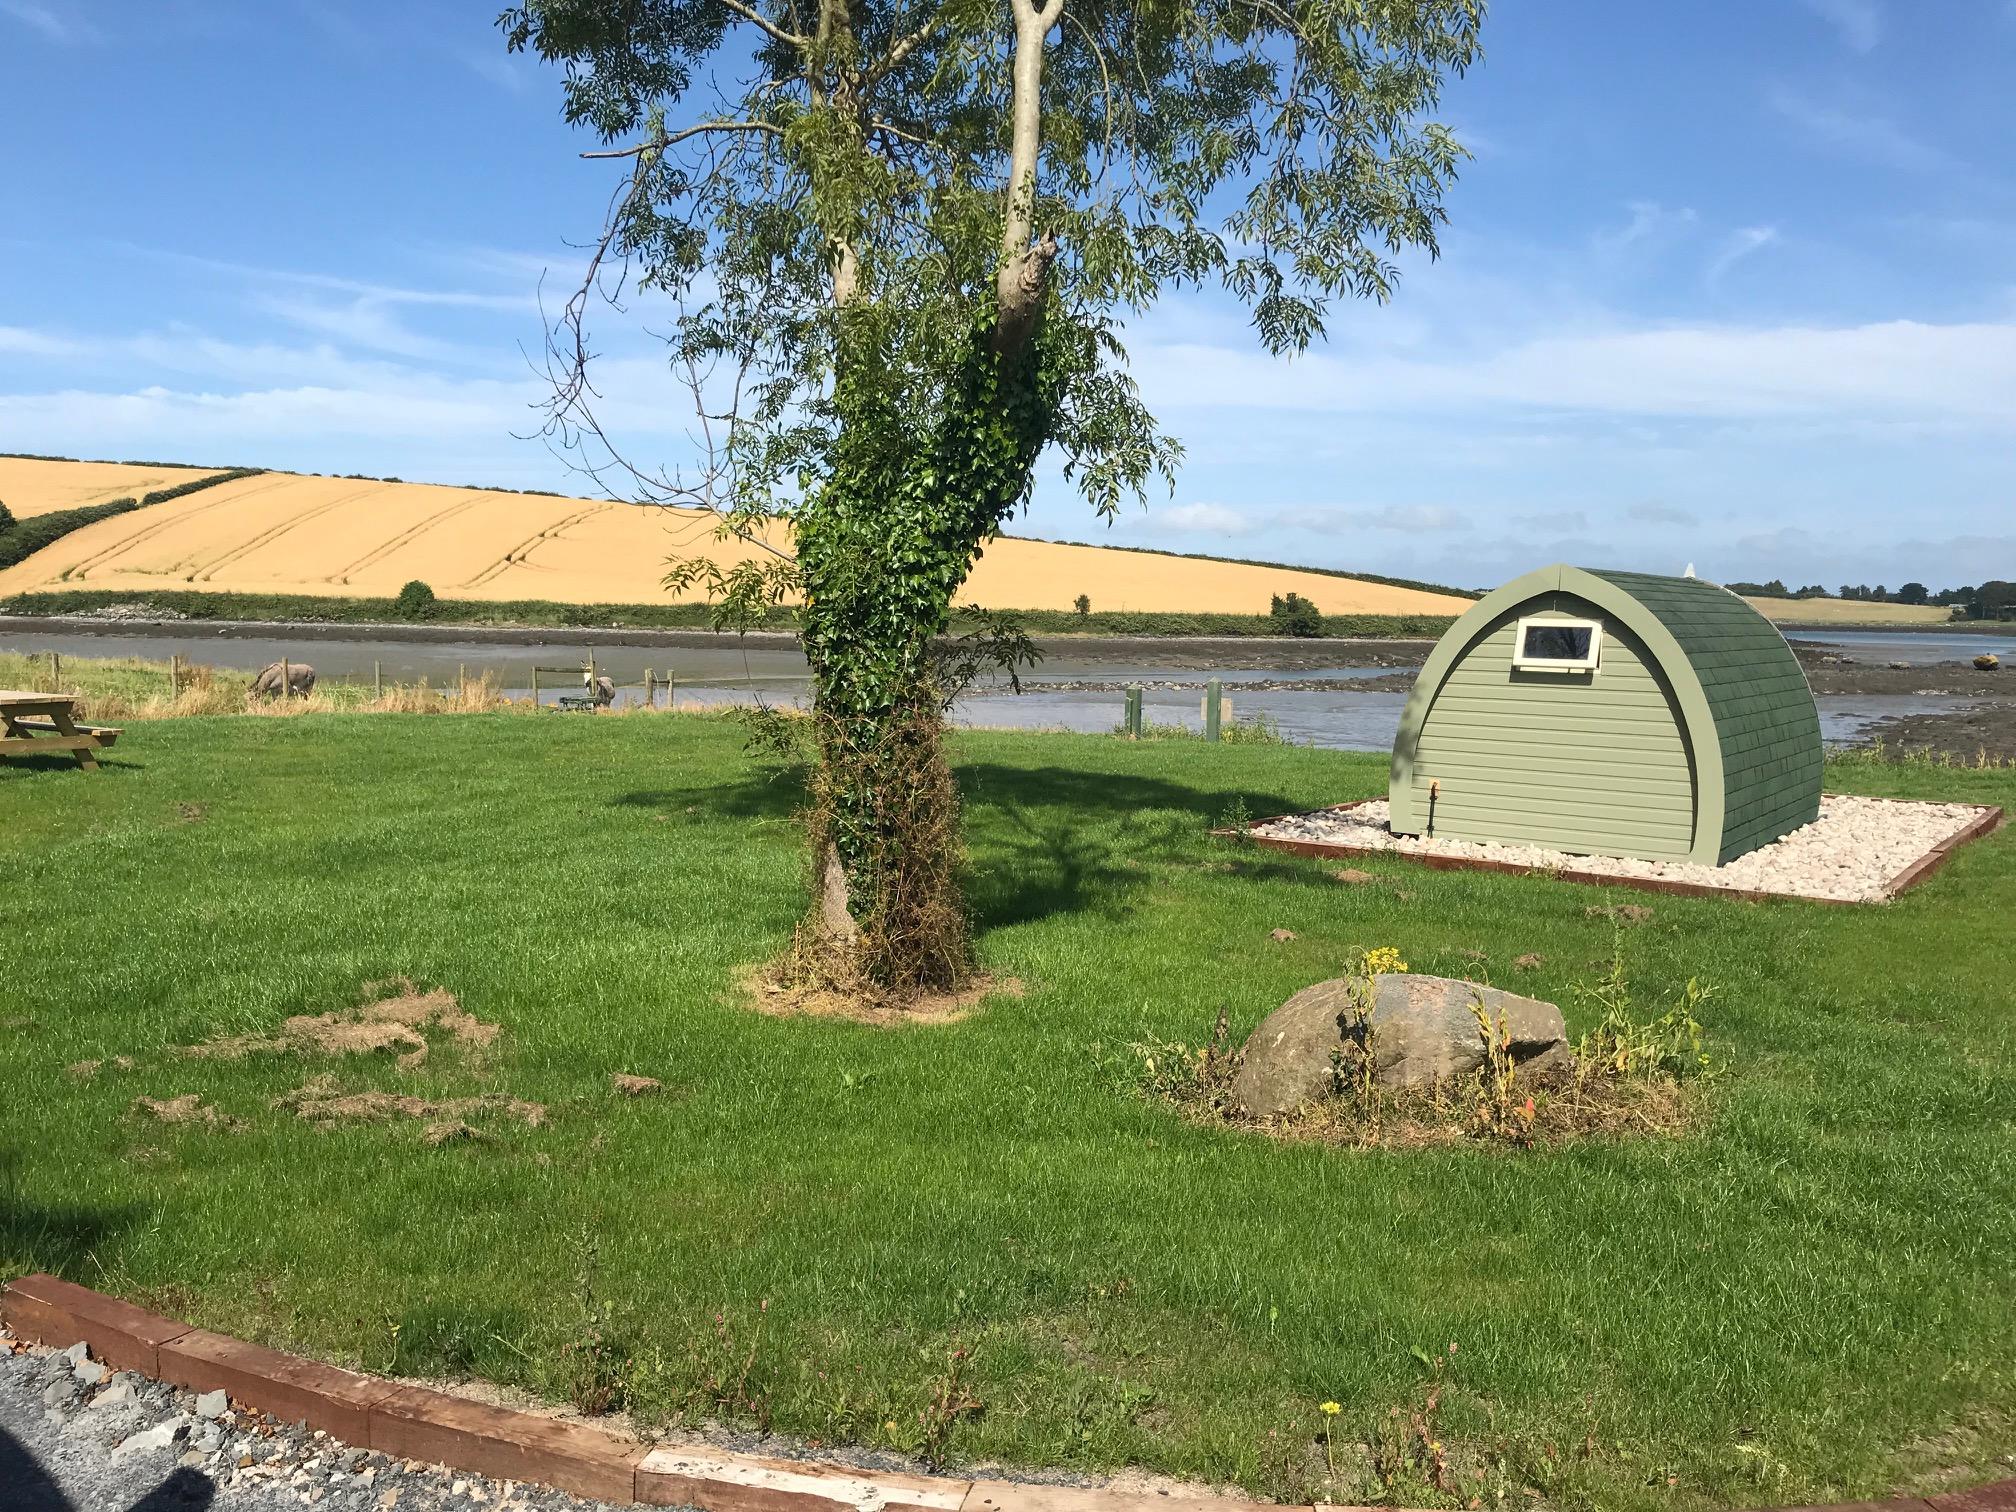 Camping Pod design